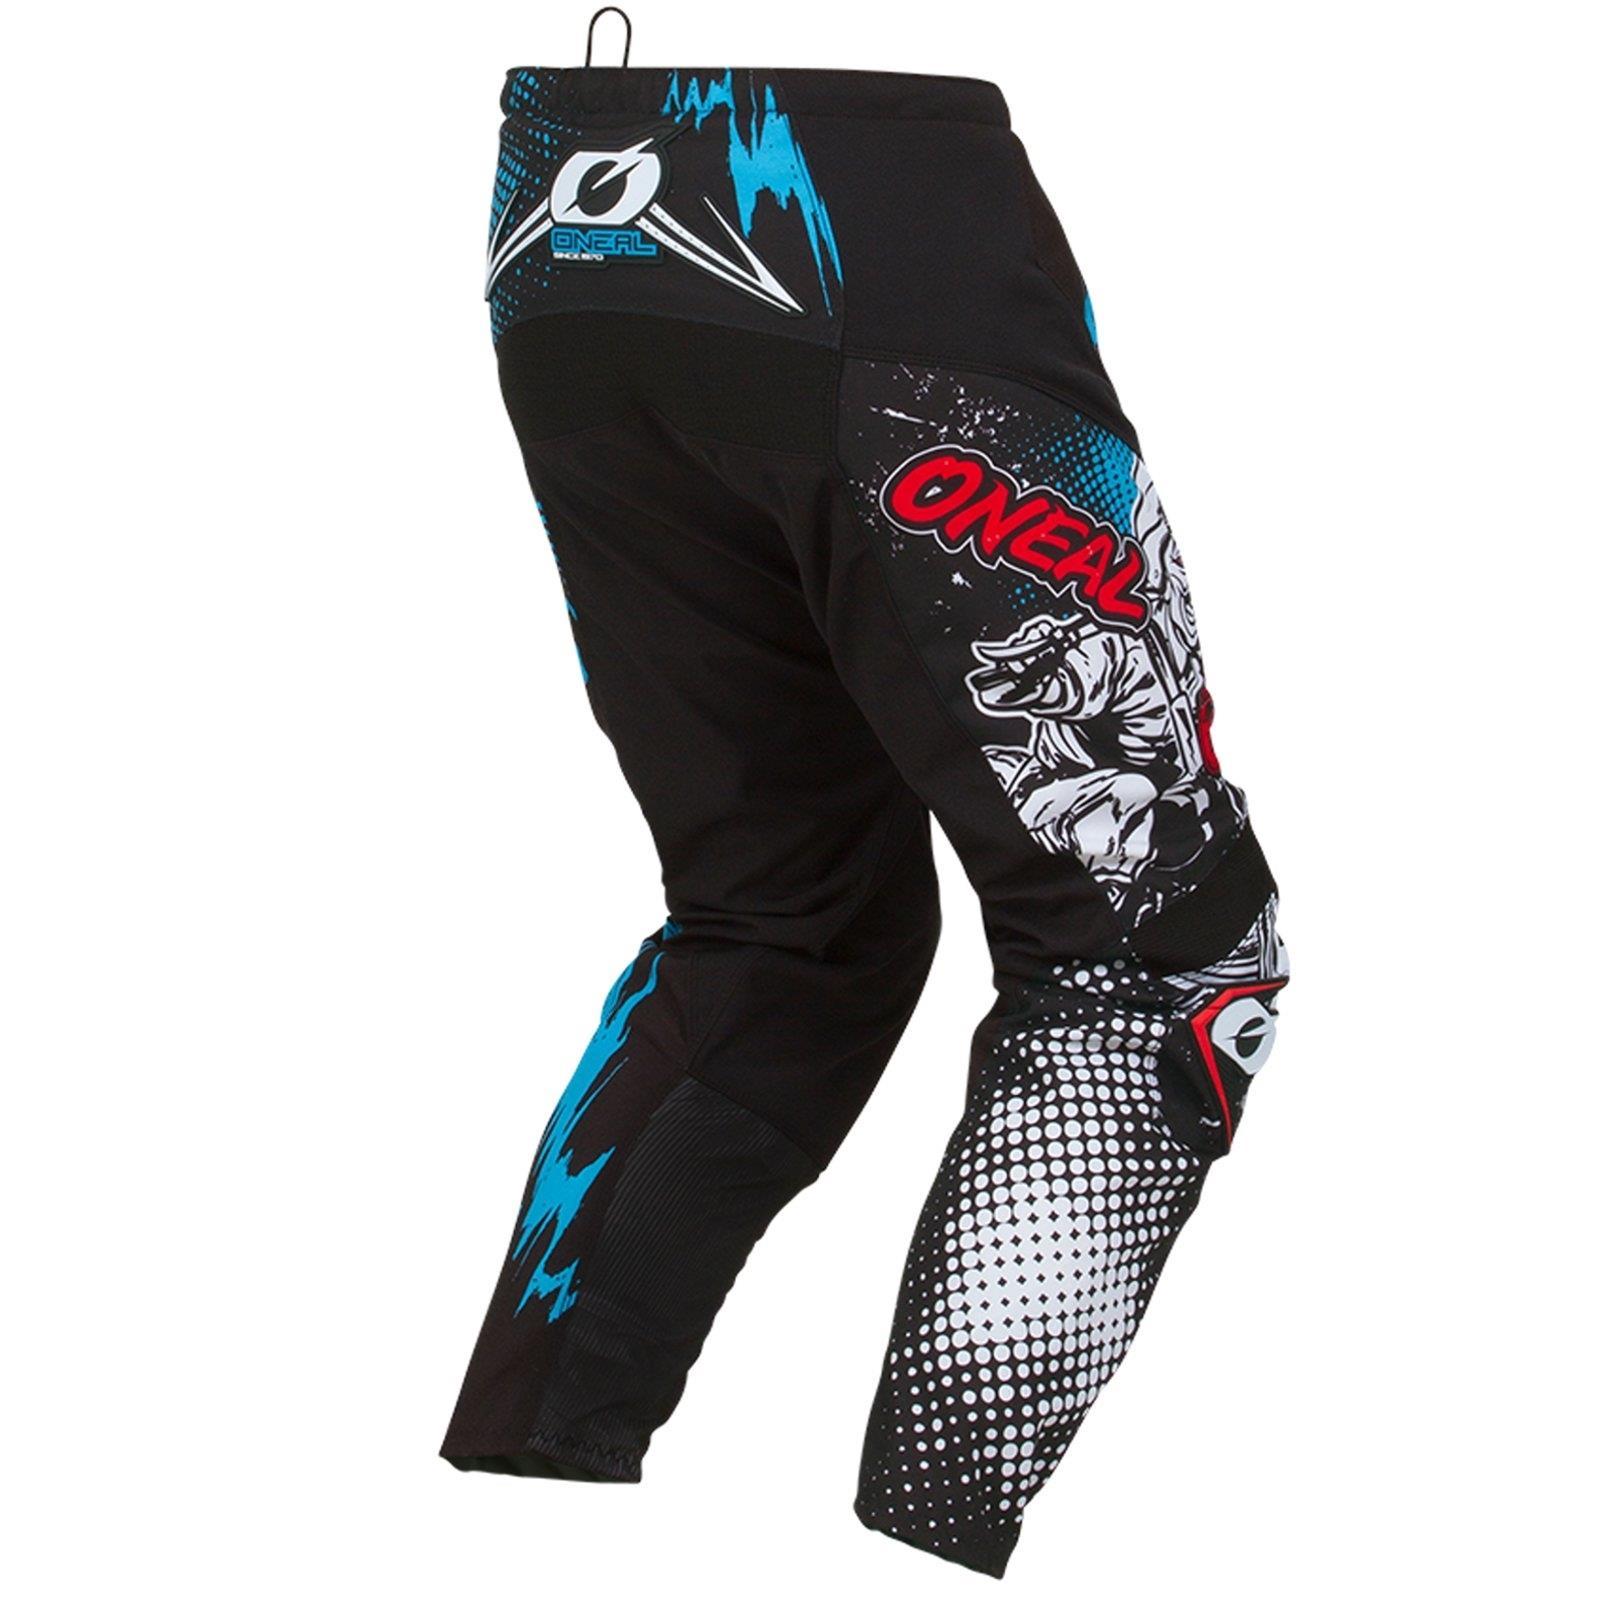 ONeal-pantalones-de-Jersey-de-los-ninos-de-pantalones-cortos-ninos-MX-bicicleta-DH-montana-bicicleta miniatura 131